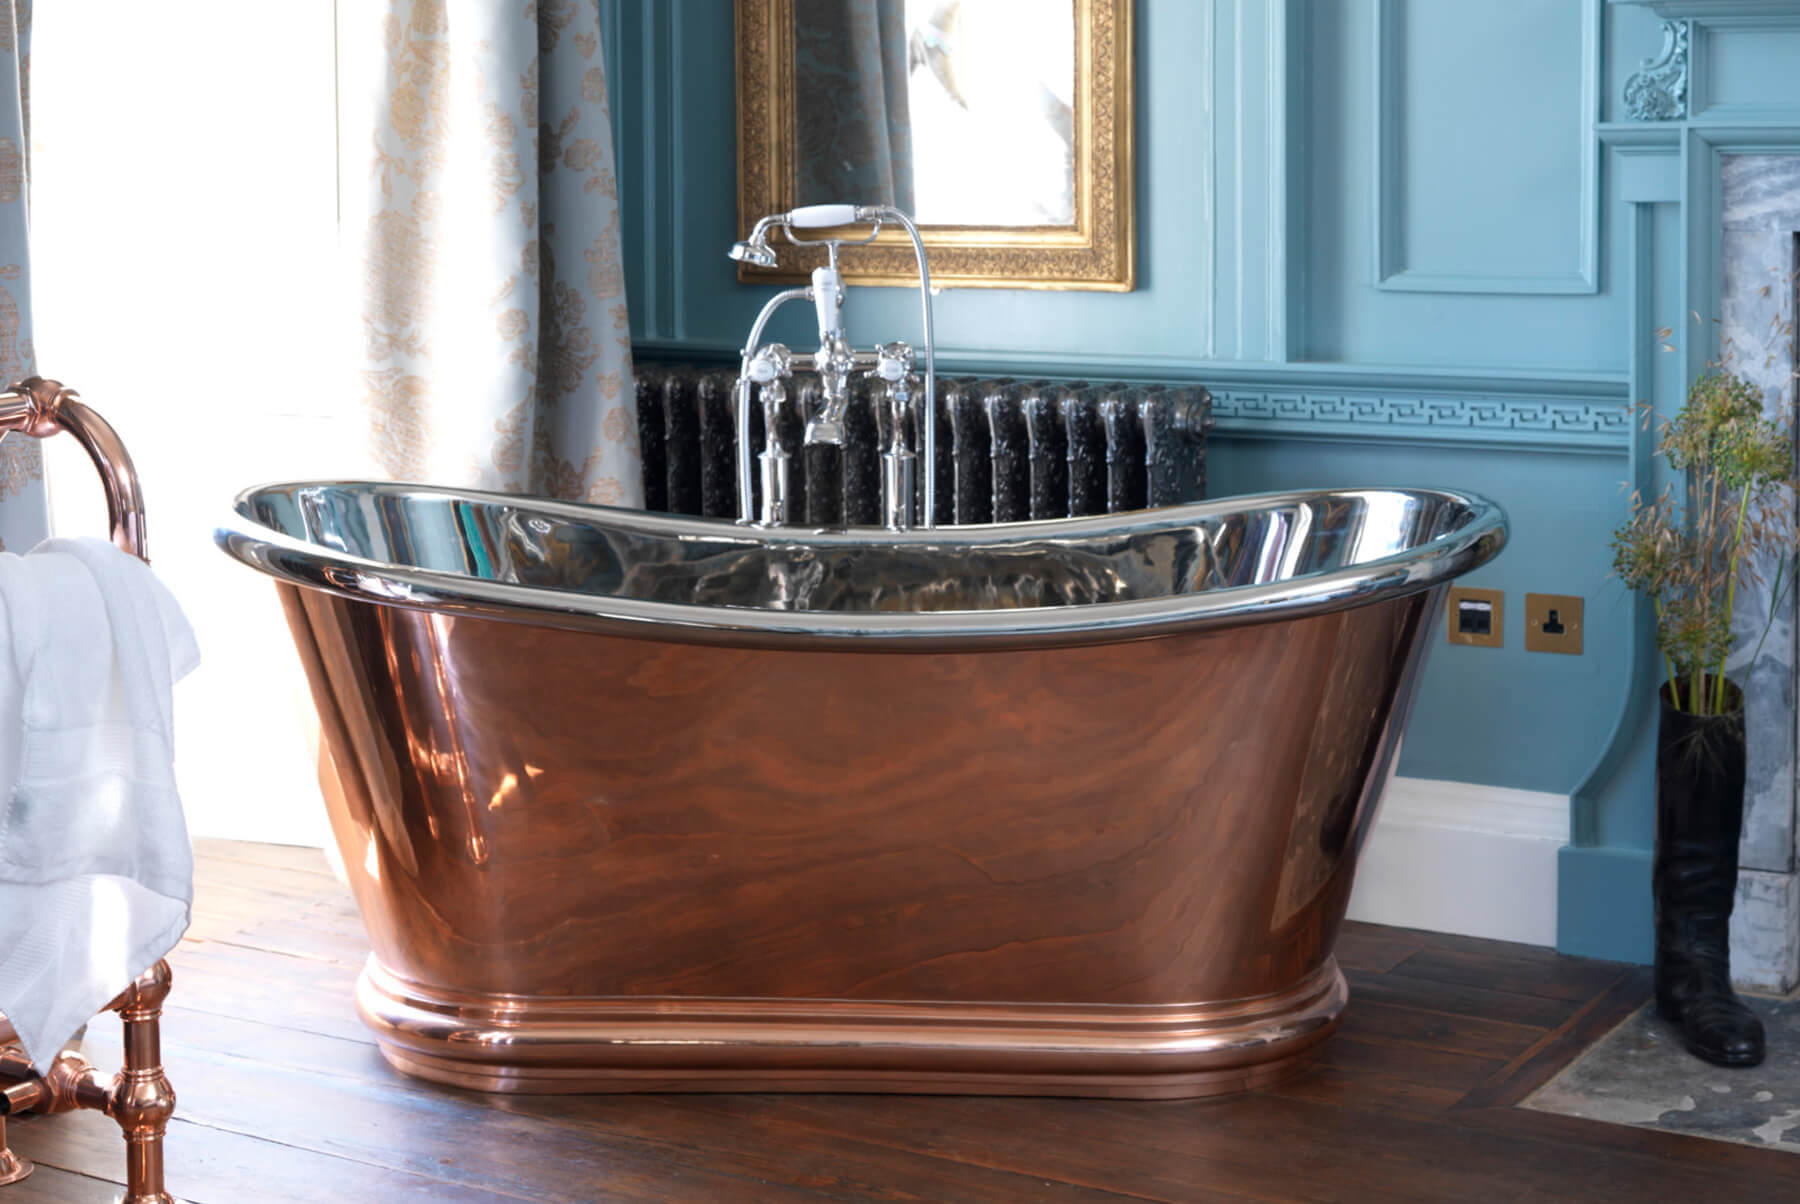 Bath-Tubs-HURLINGHAM-BULLE-COPPER-MAIN-1800x1204